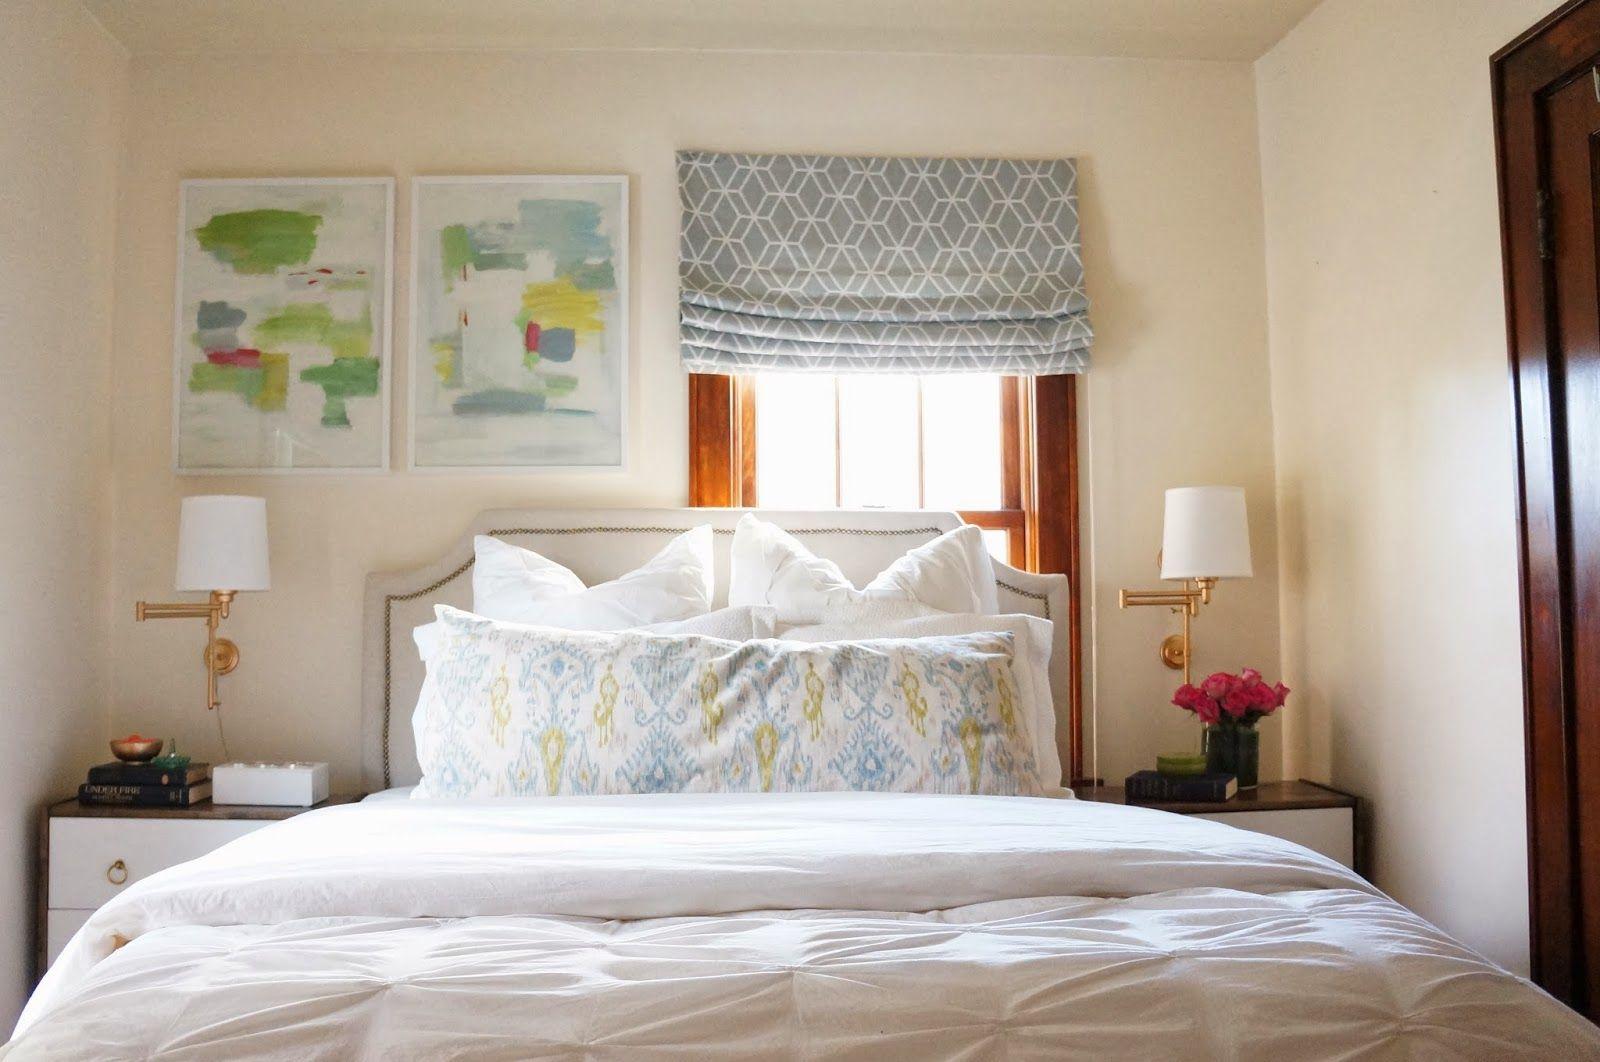 Home Tour Master Bedroom Reveal Remodel Bedroom Bedroom